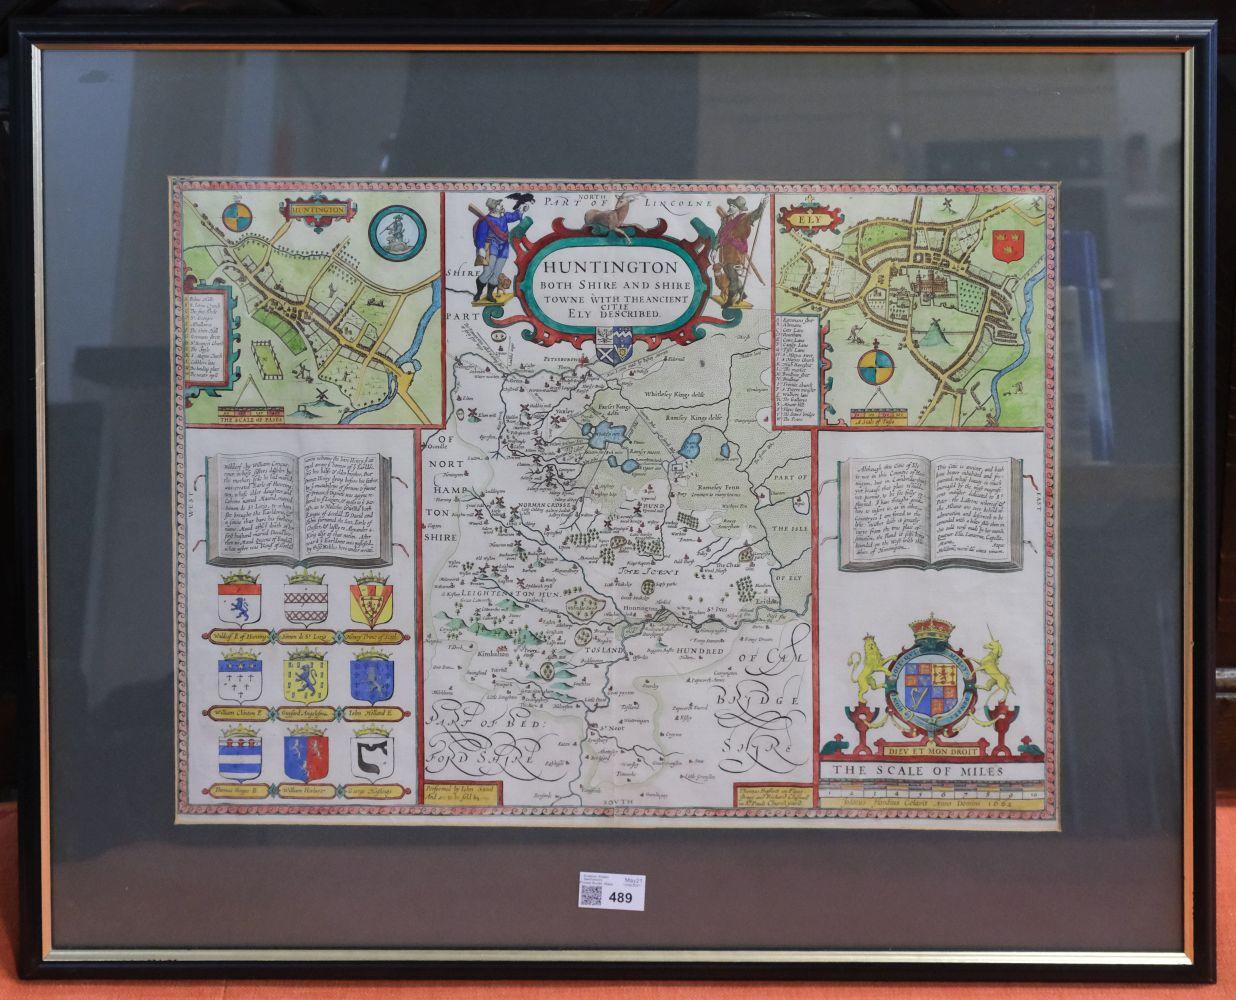 * Huntingdonshire. Speed (John), Huntingdon both Shire and Shire Towne..., 1676 - Image 2 of 3